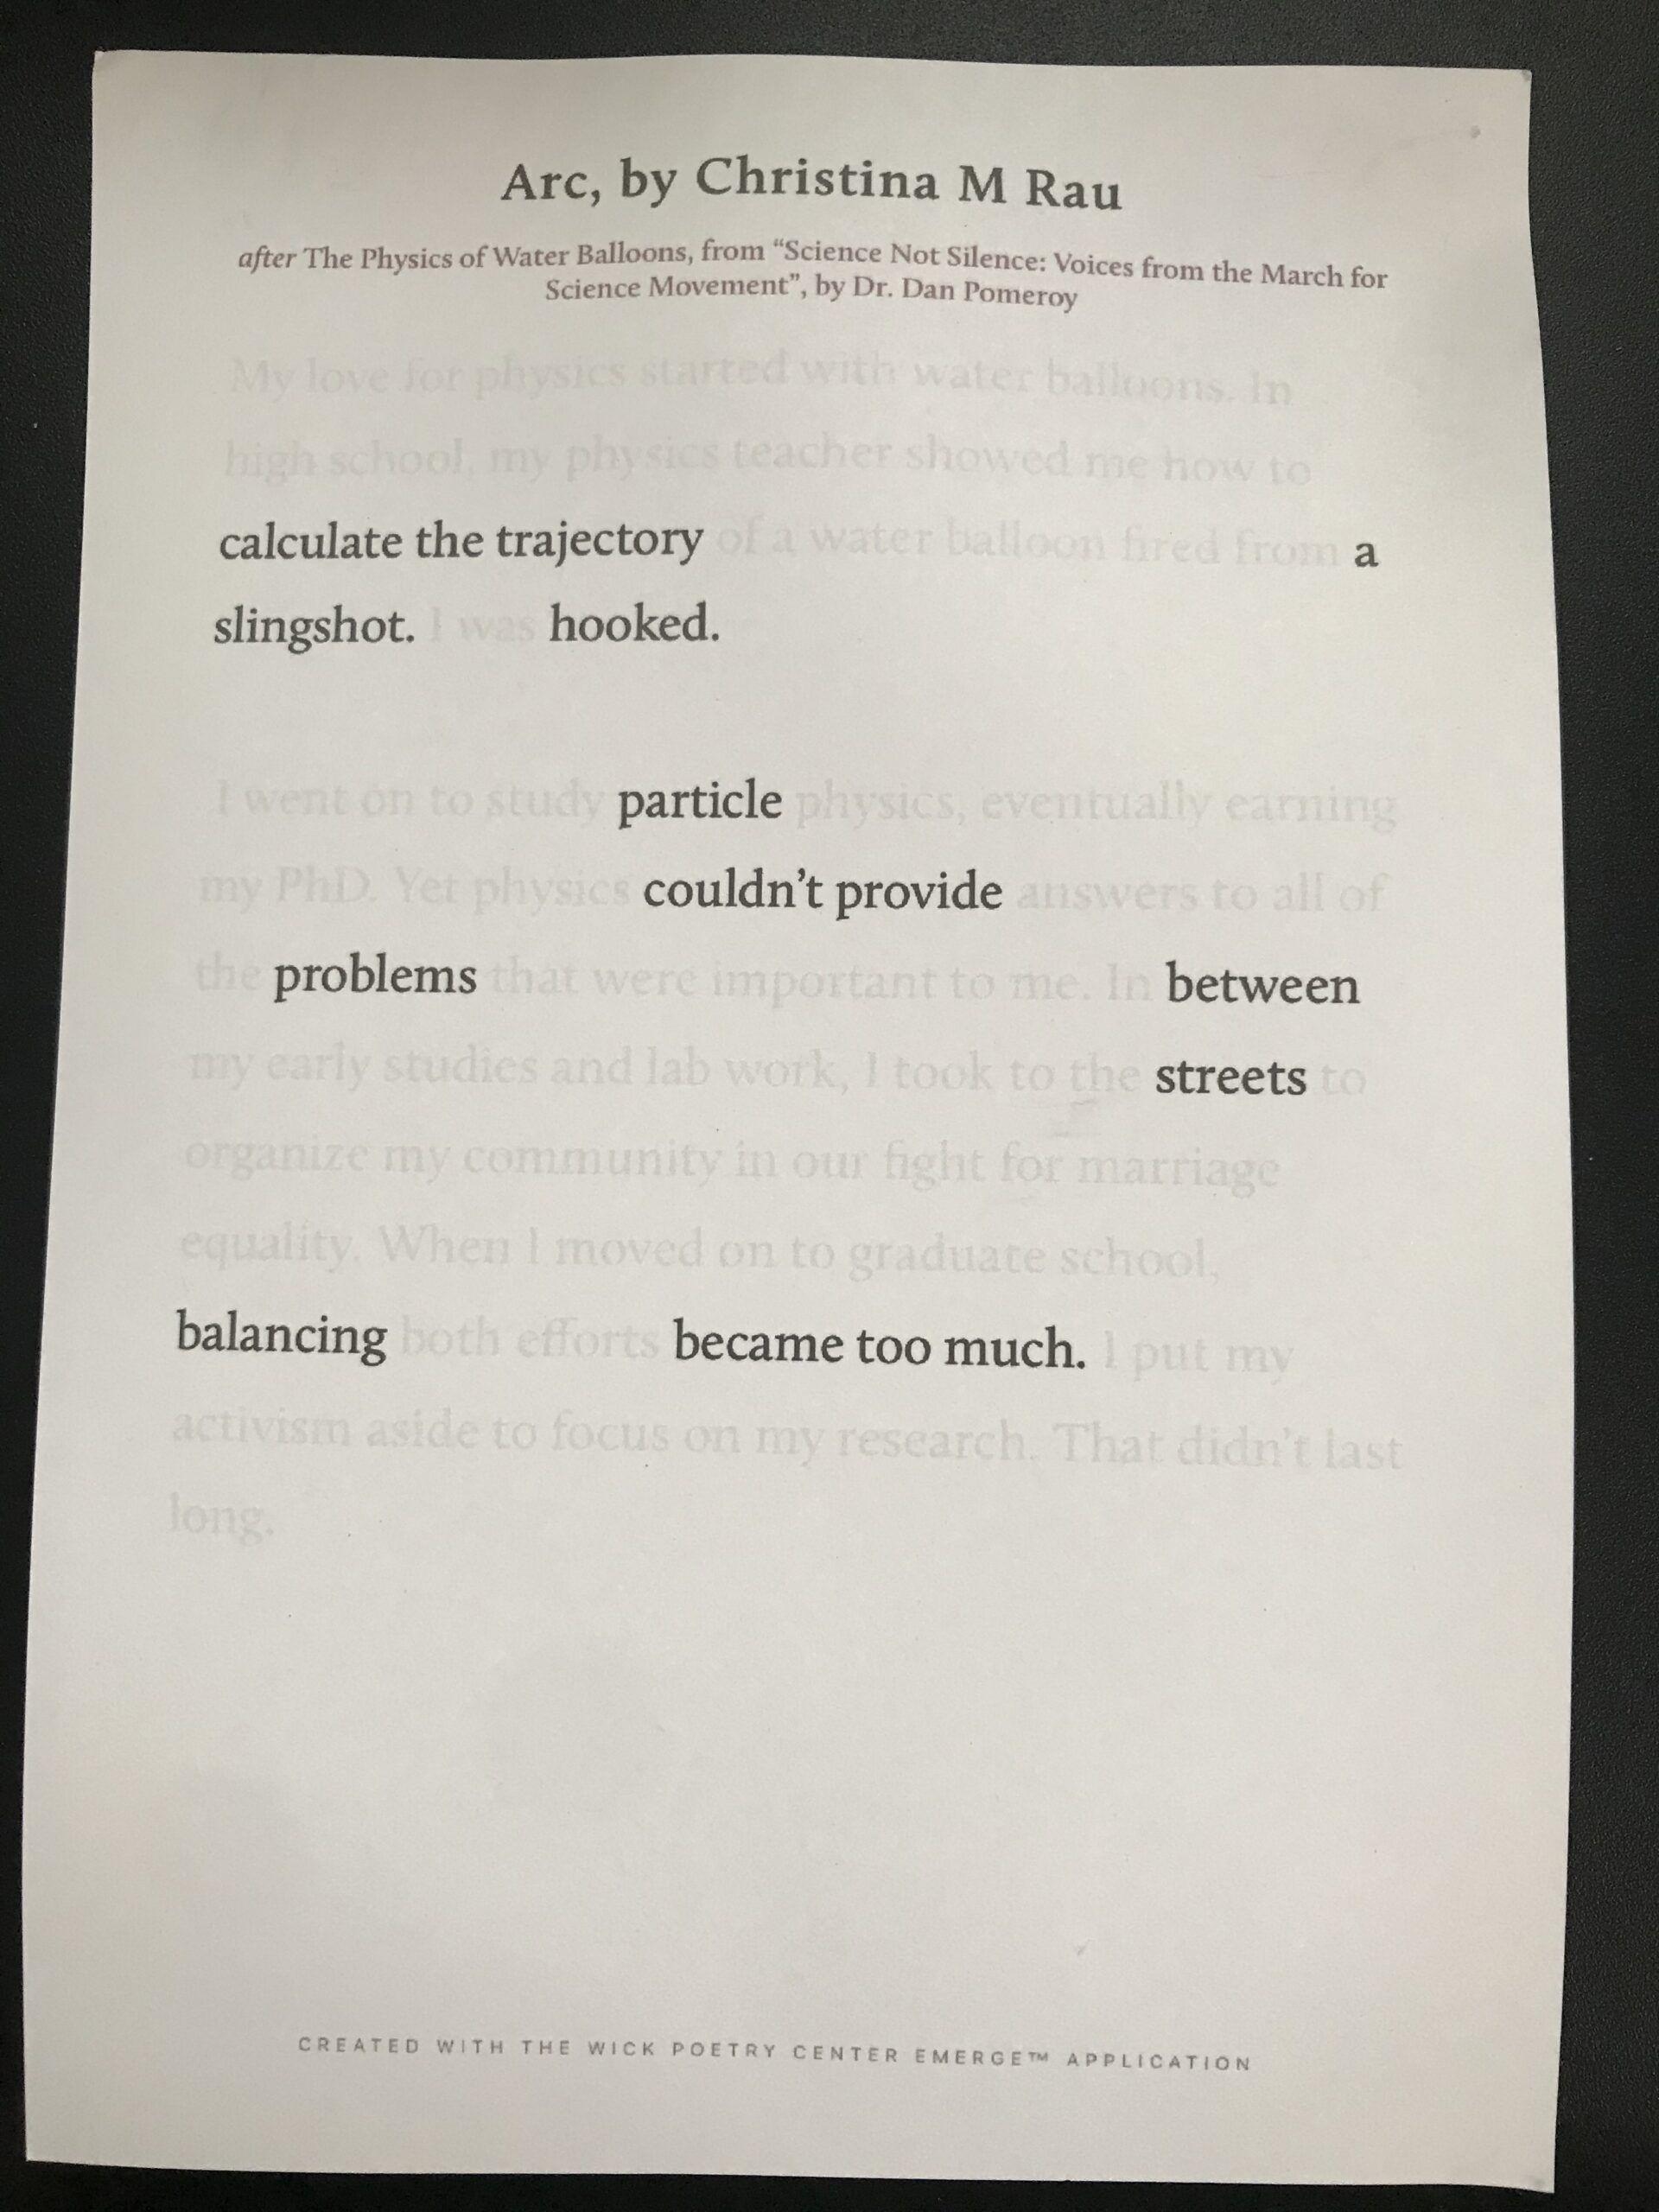 Example of digital blackout poetry.